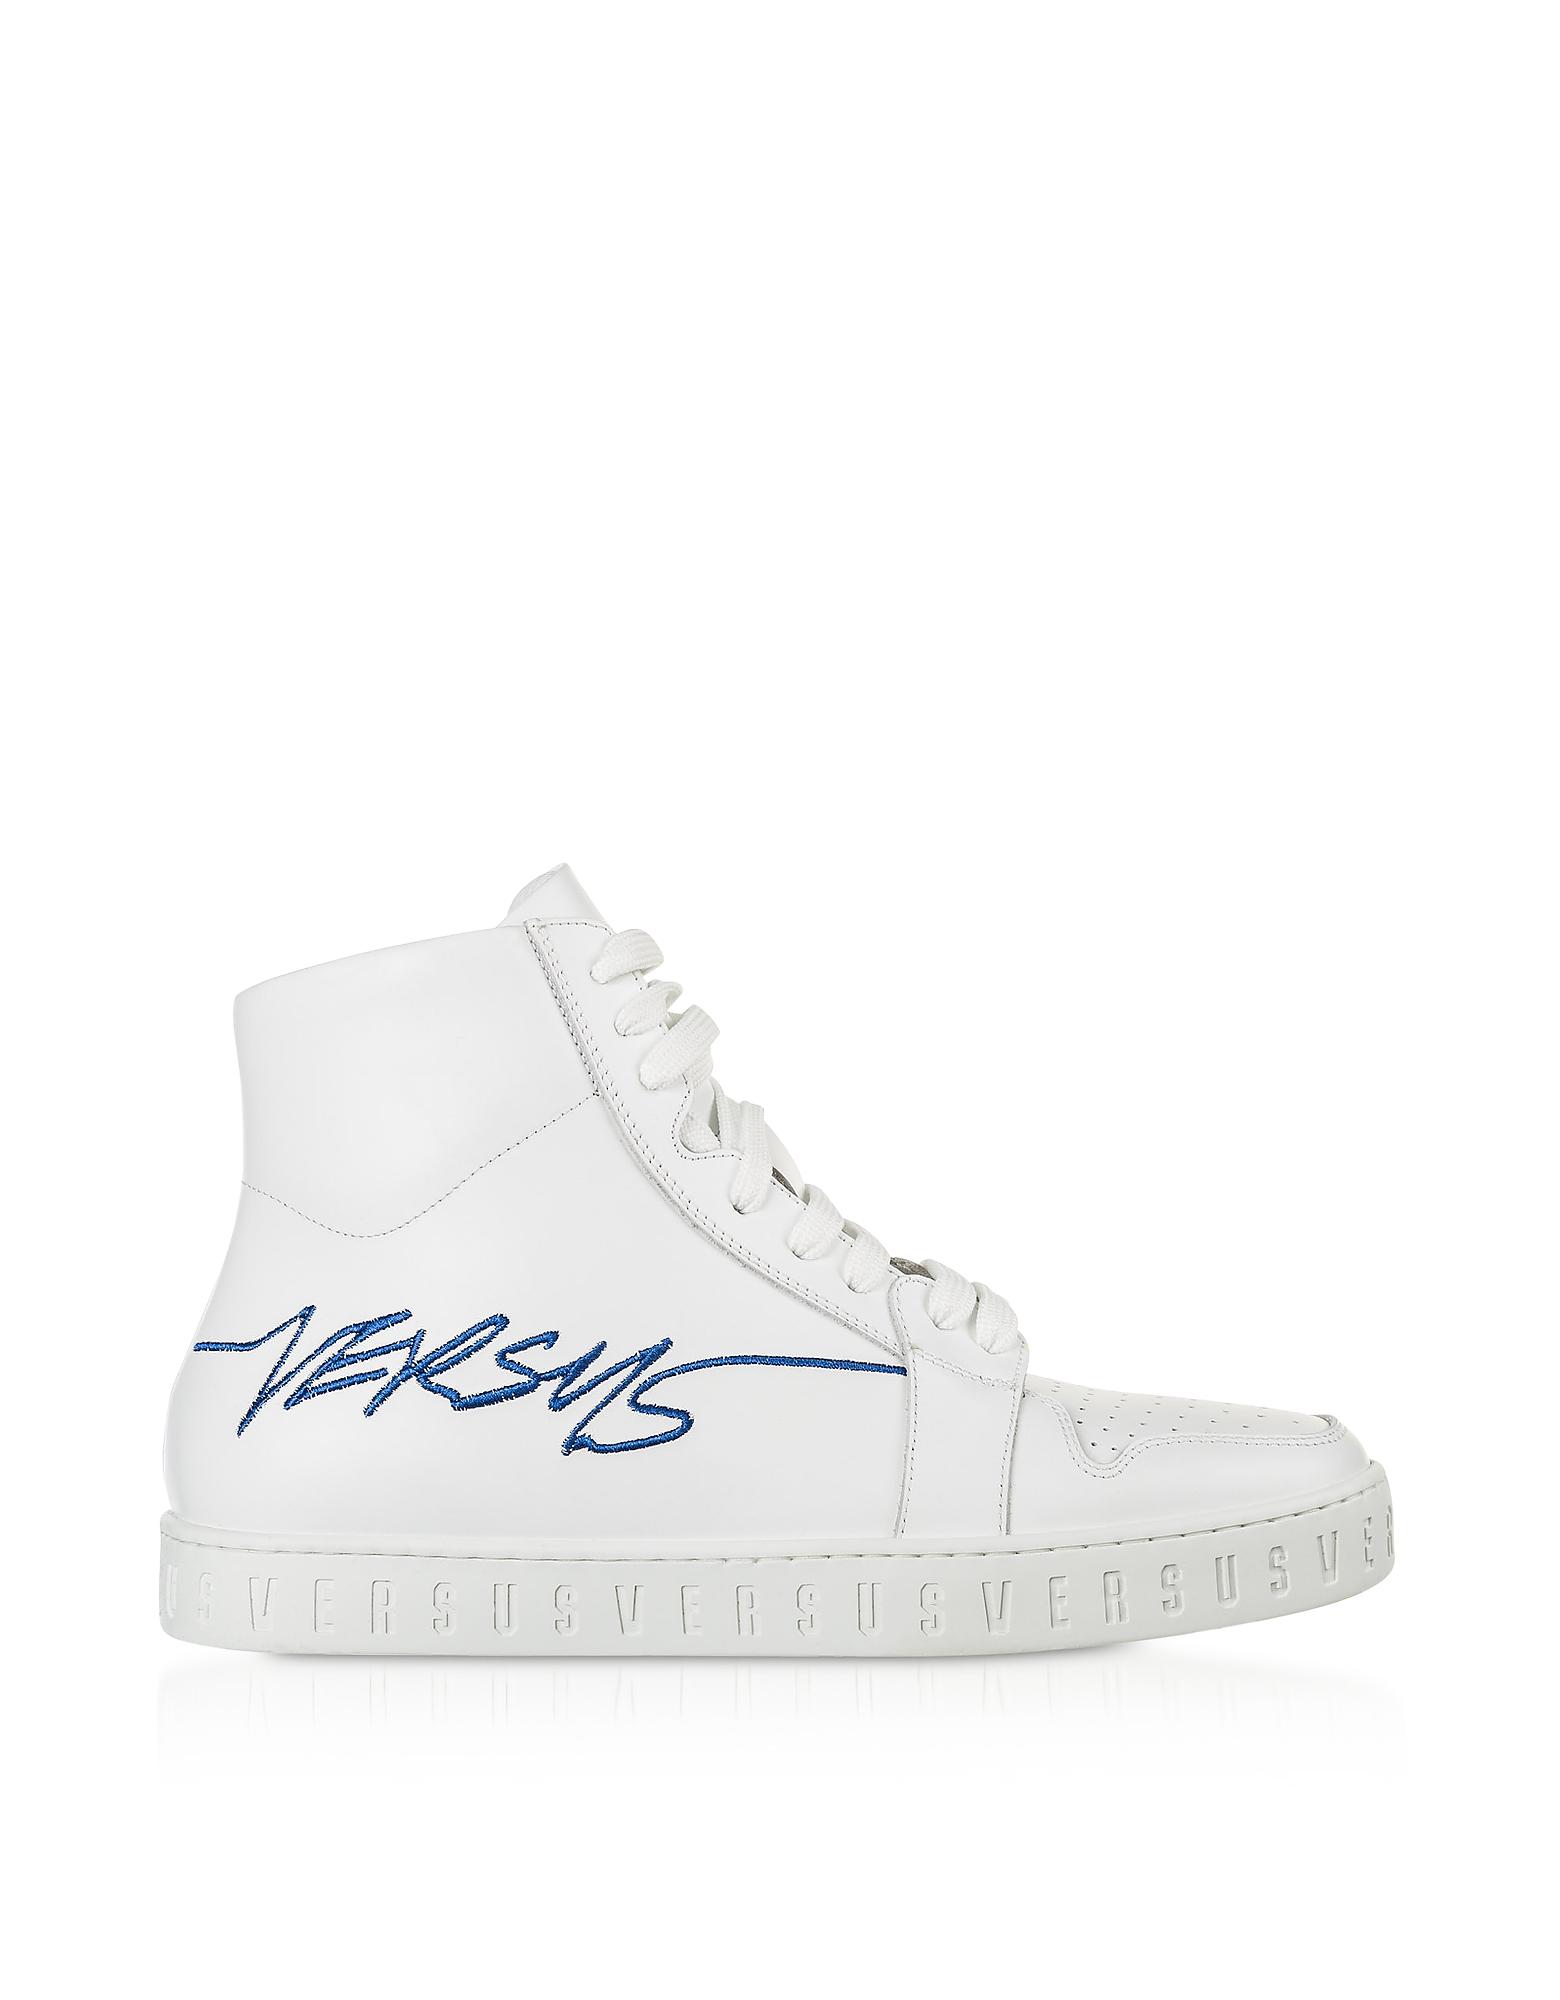 Optic White Men's Sneakers